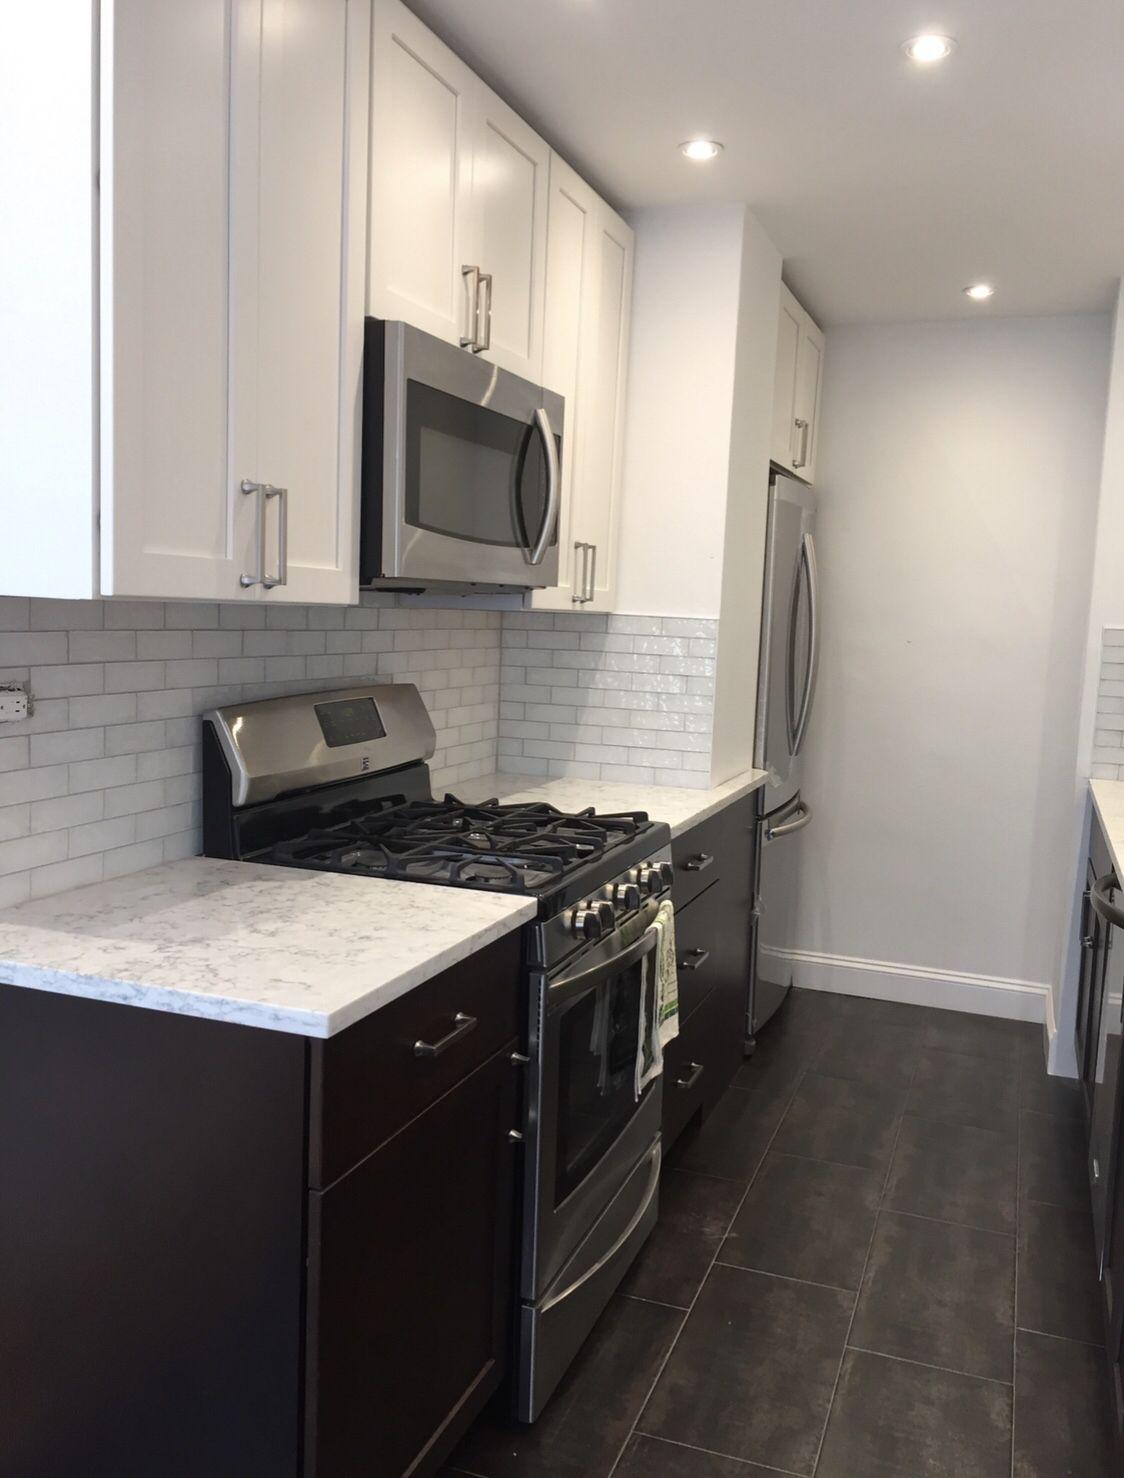 White Shaker Cabinets Mixed With Dark Cherry Base White Shaker Cabinets Kitchen And Bath Design Kitchen Design